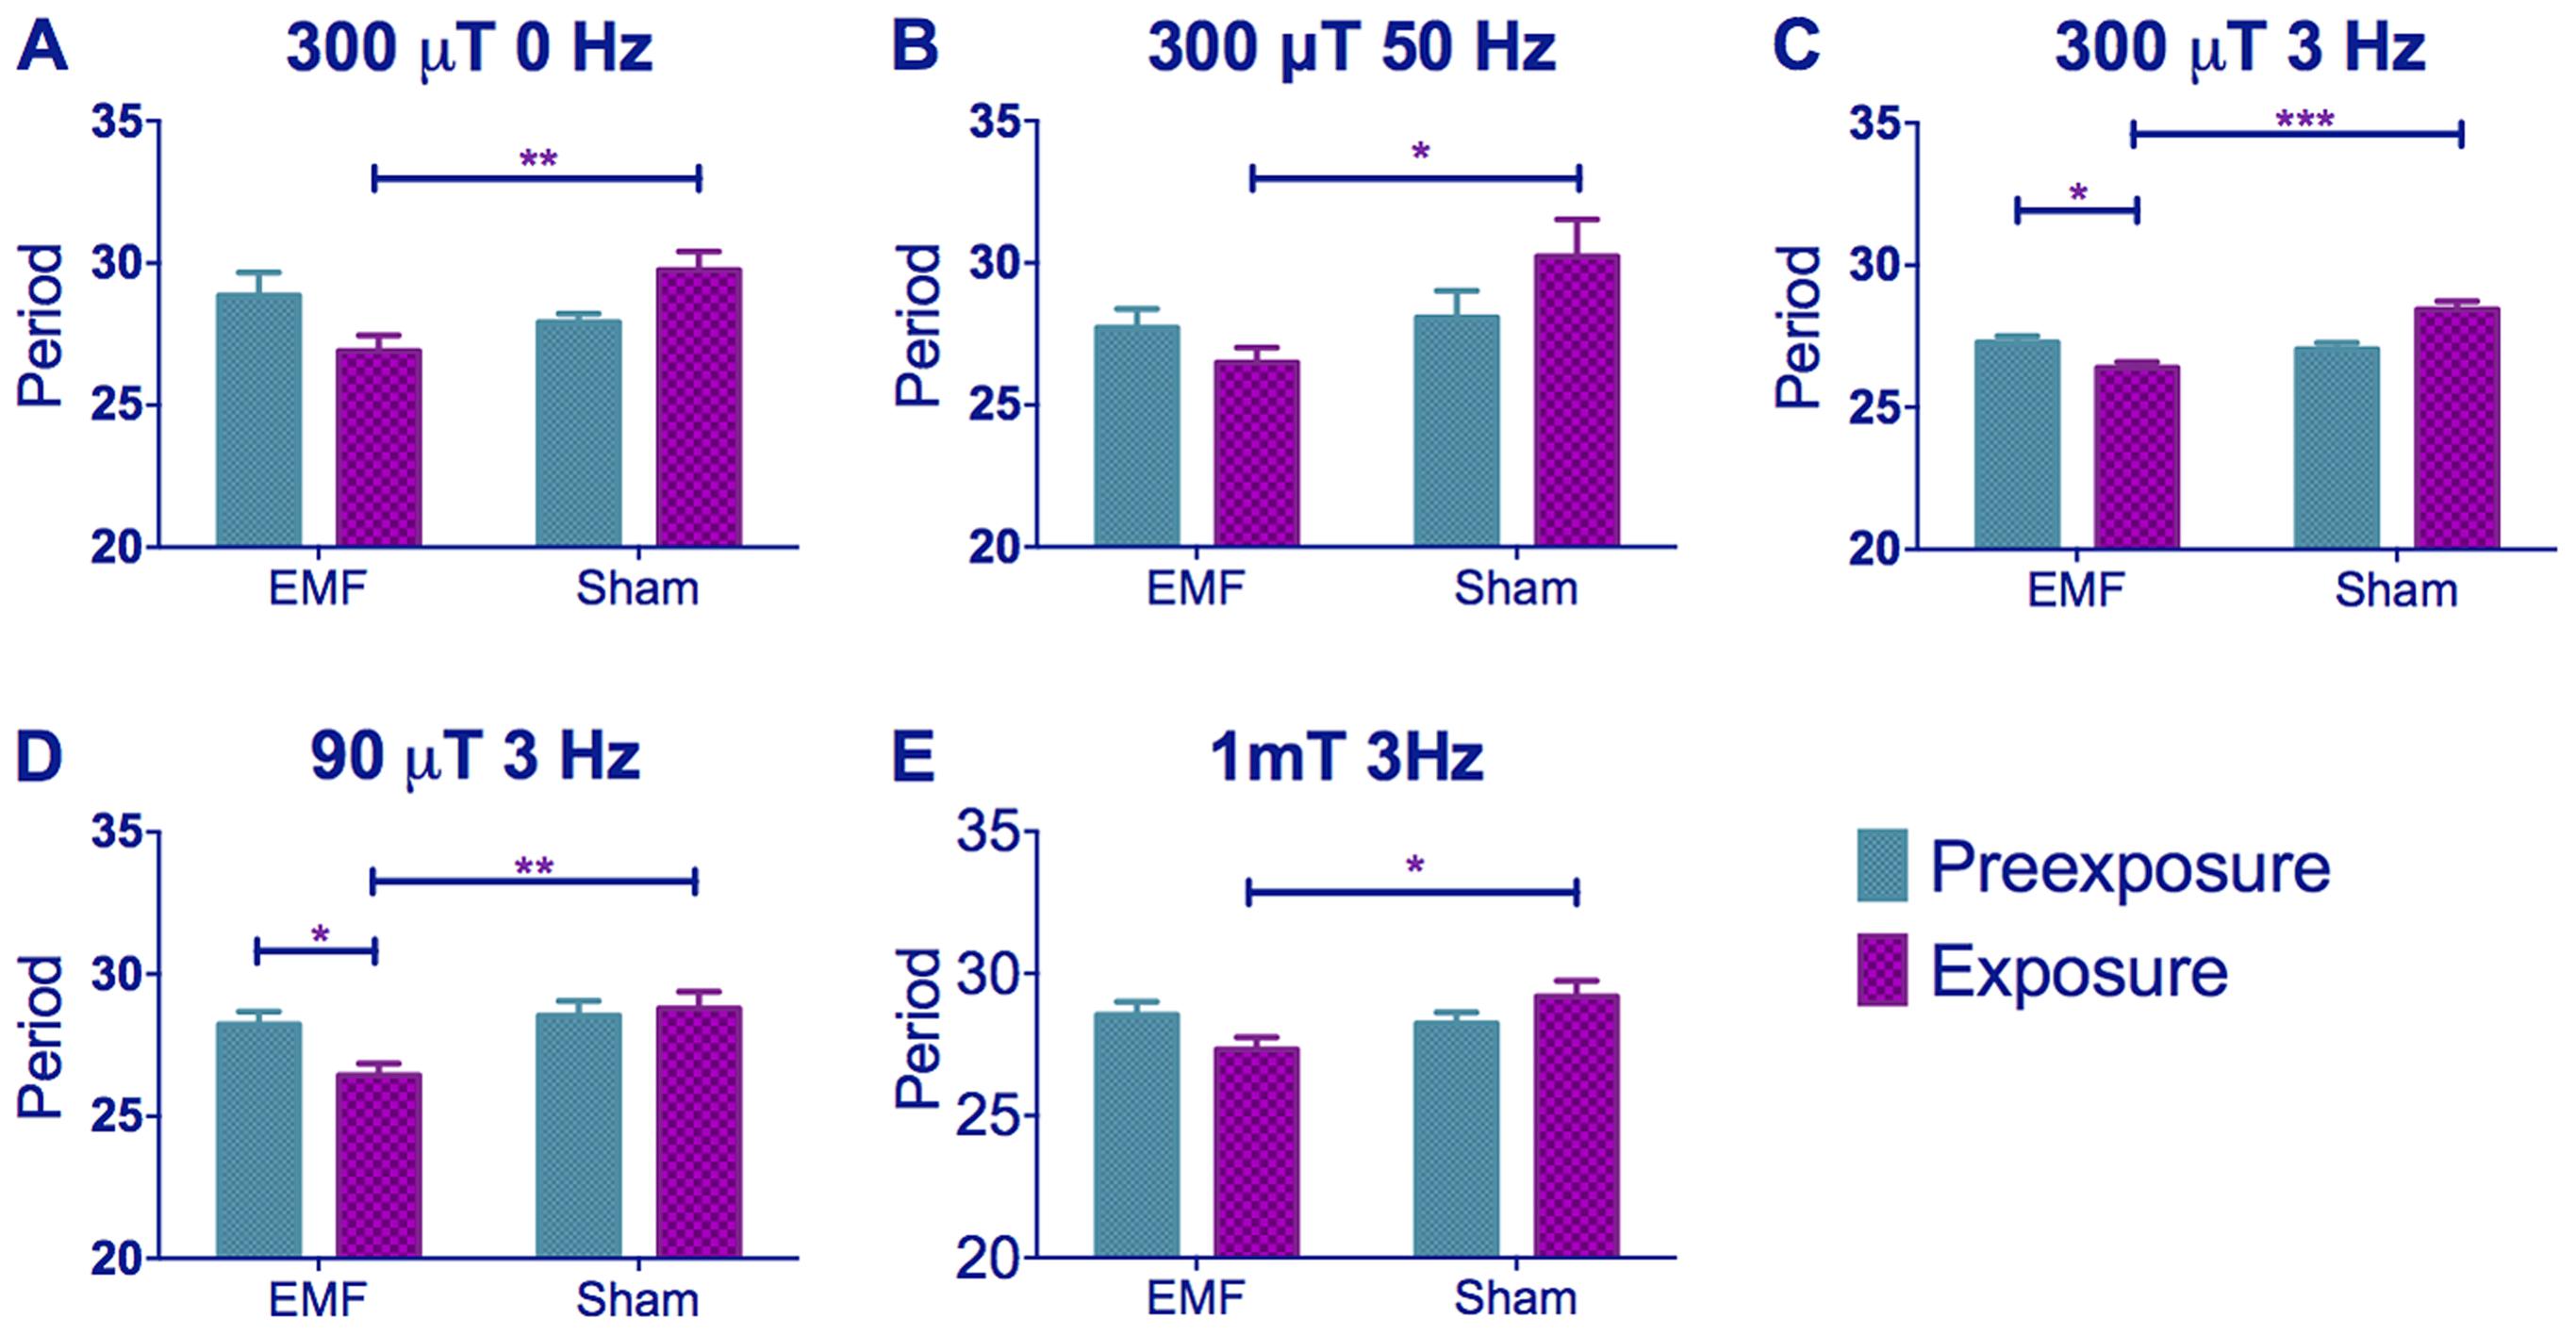 EMF exposure shortens free-running circadian periods in dim blue light.